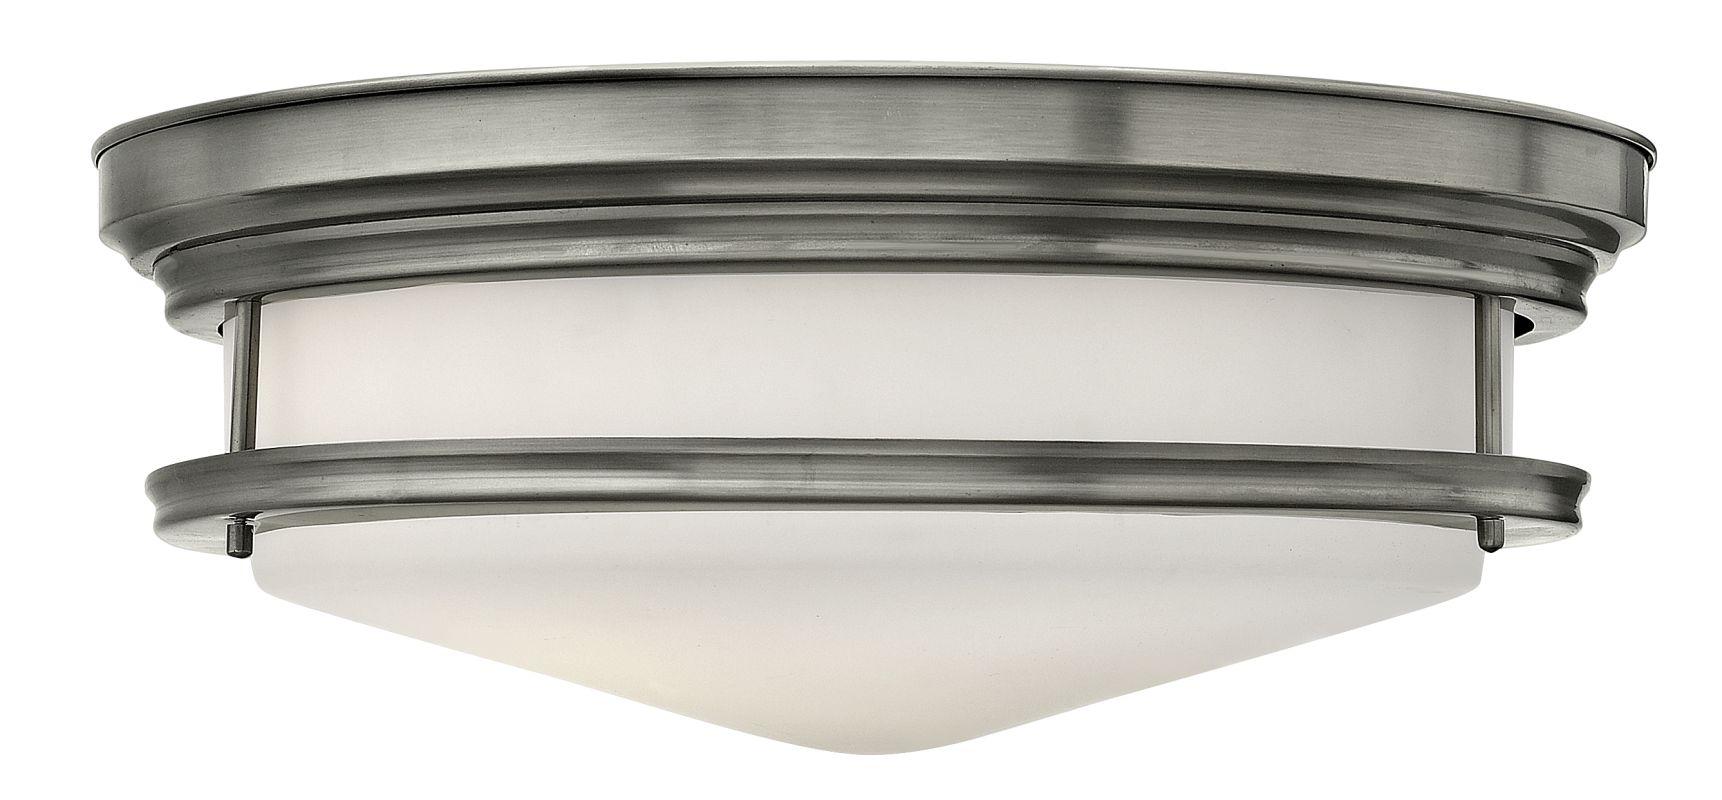 Hinkley Lighting 3304 4 Light Indoor Flush Mount Ceiling Fixture from Sale $399.00 ITEM#: 2173167 MODEL# :3304AN UPC#: 640665330403 :